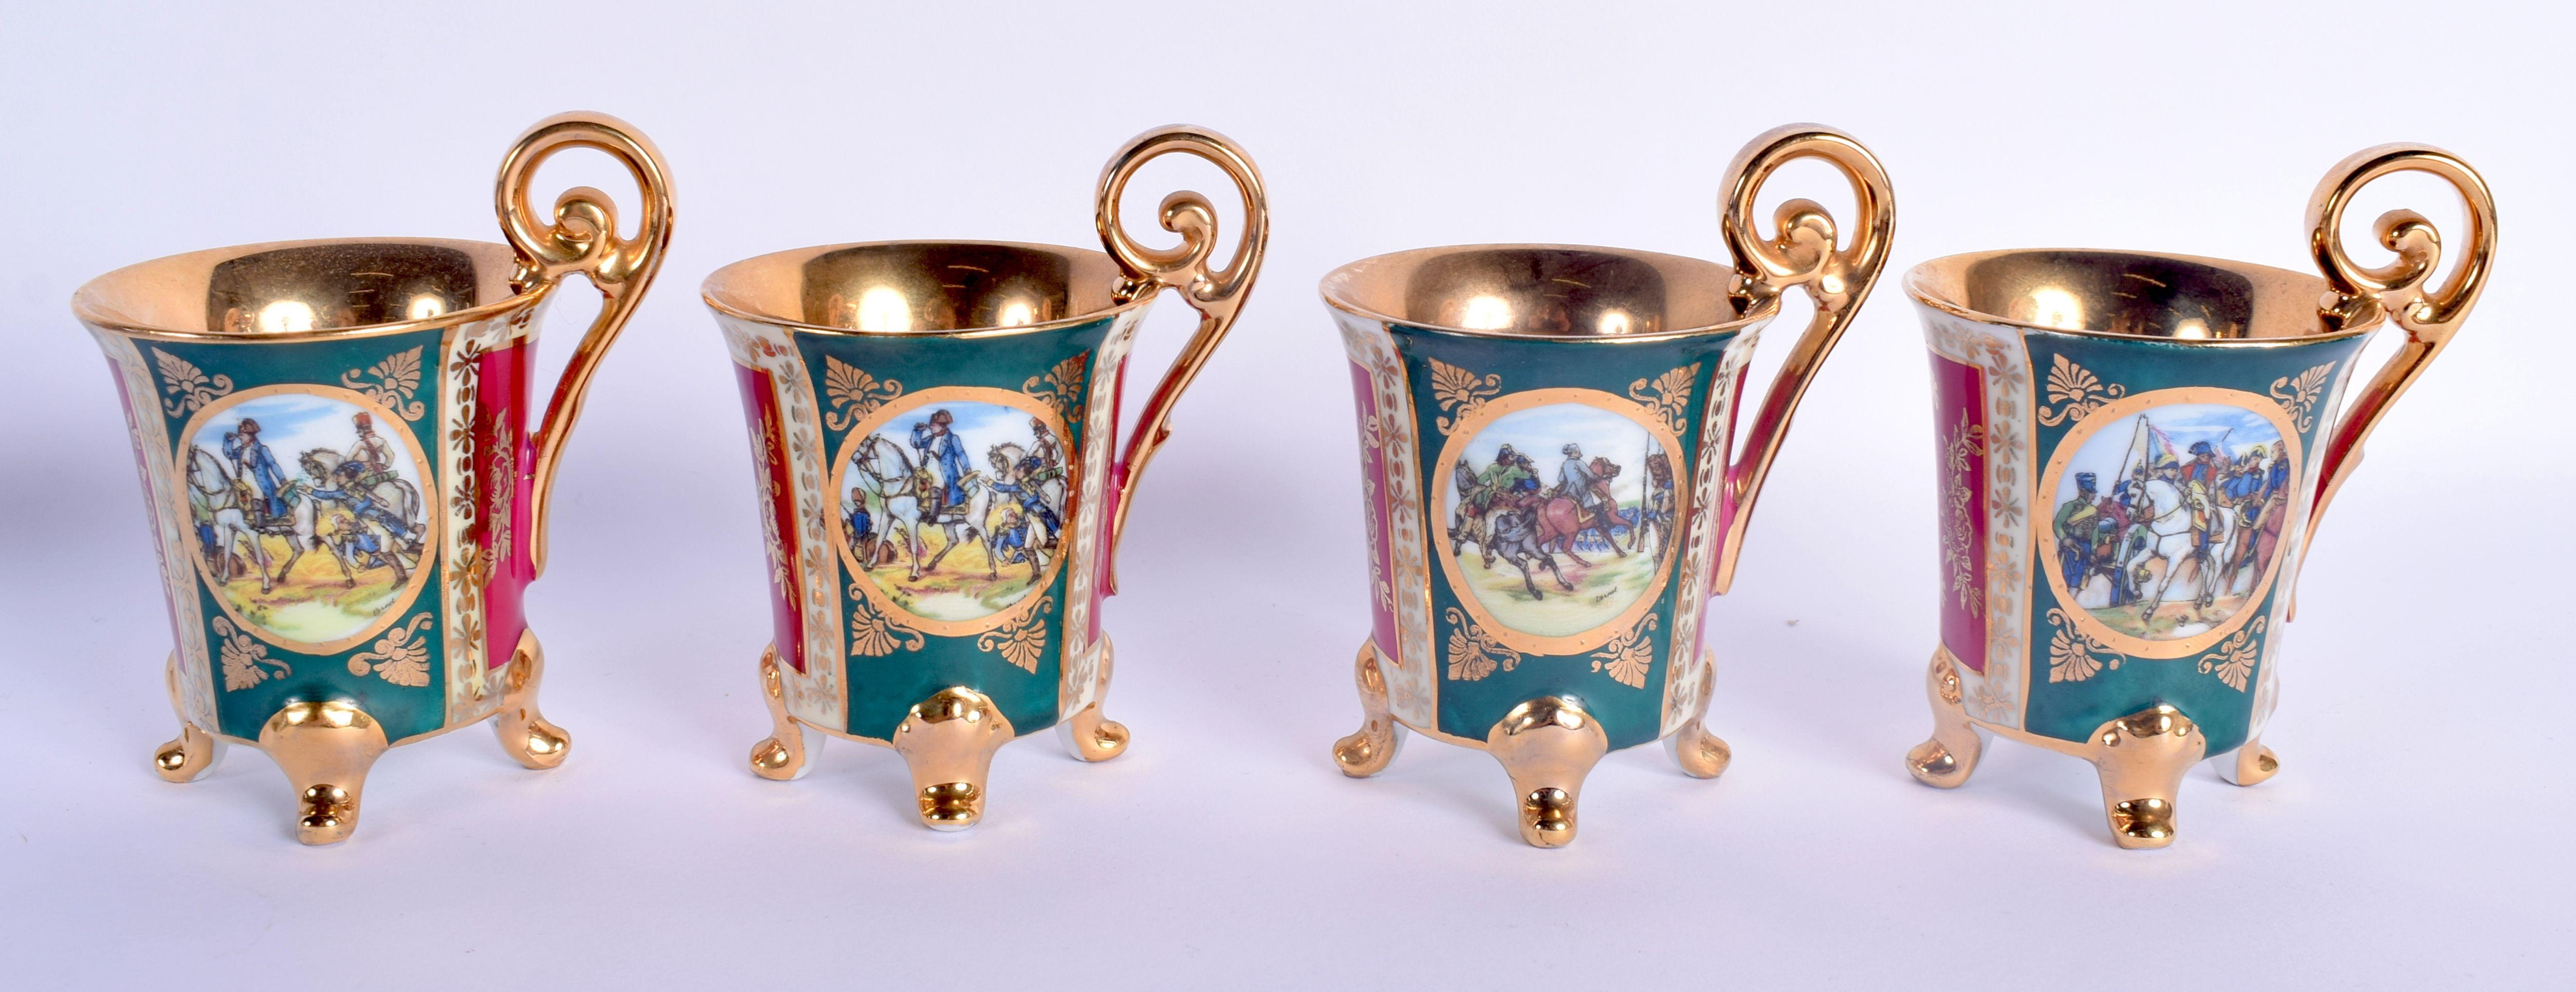 A VINTAGE J K CARLSBAD BAVARIA PORCELAIN VIENNA STYLE TEASET decorated with Napoleonic scenes. Large - Image 17 of 22